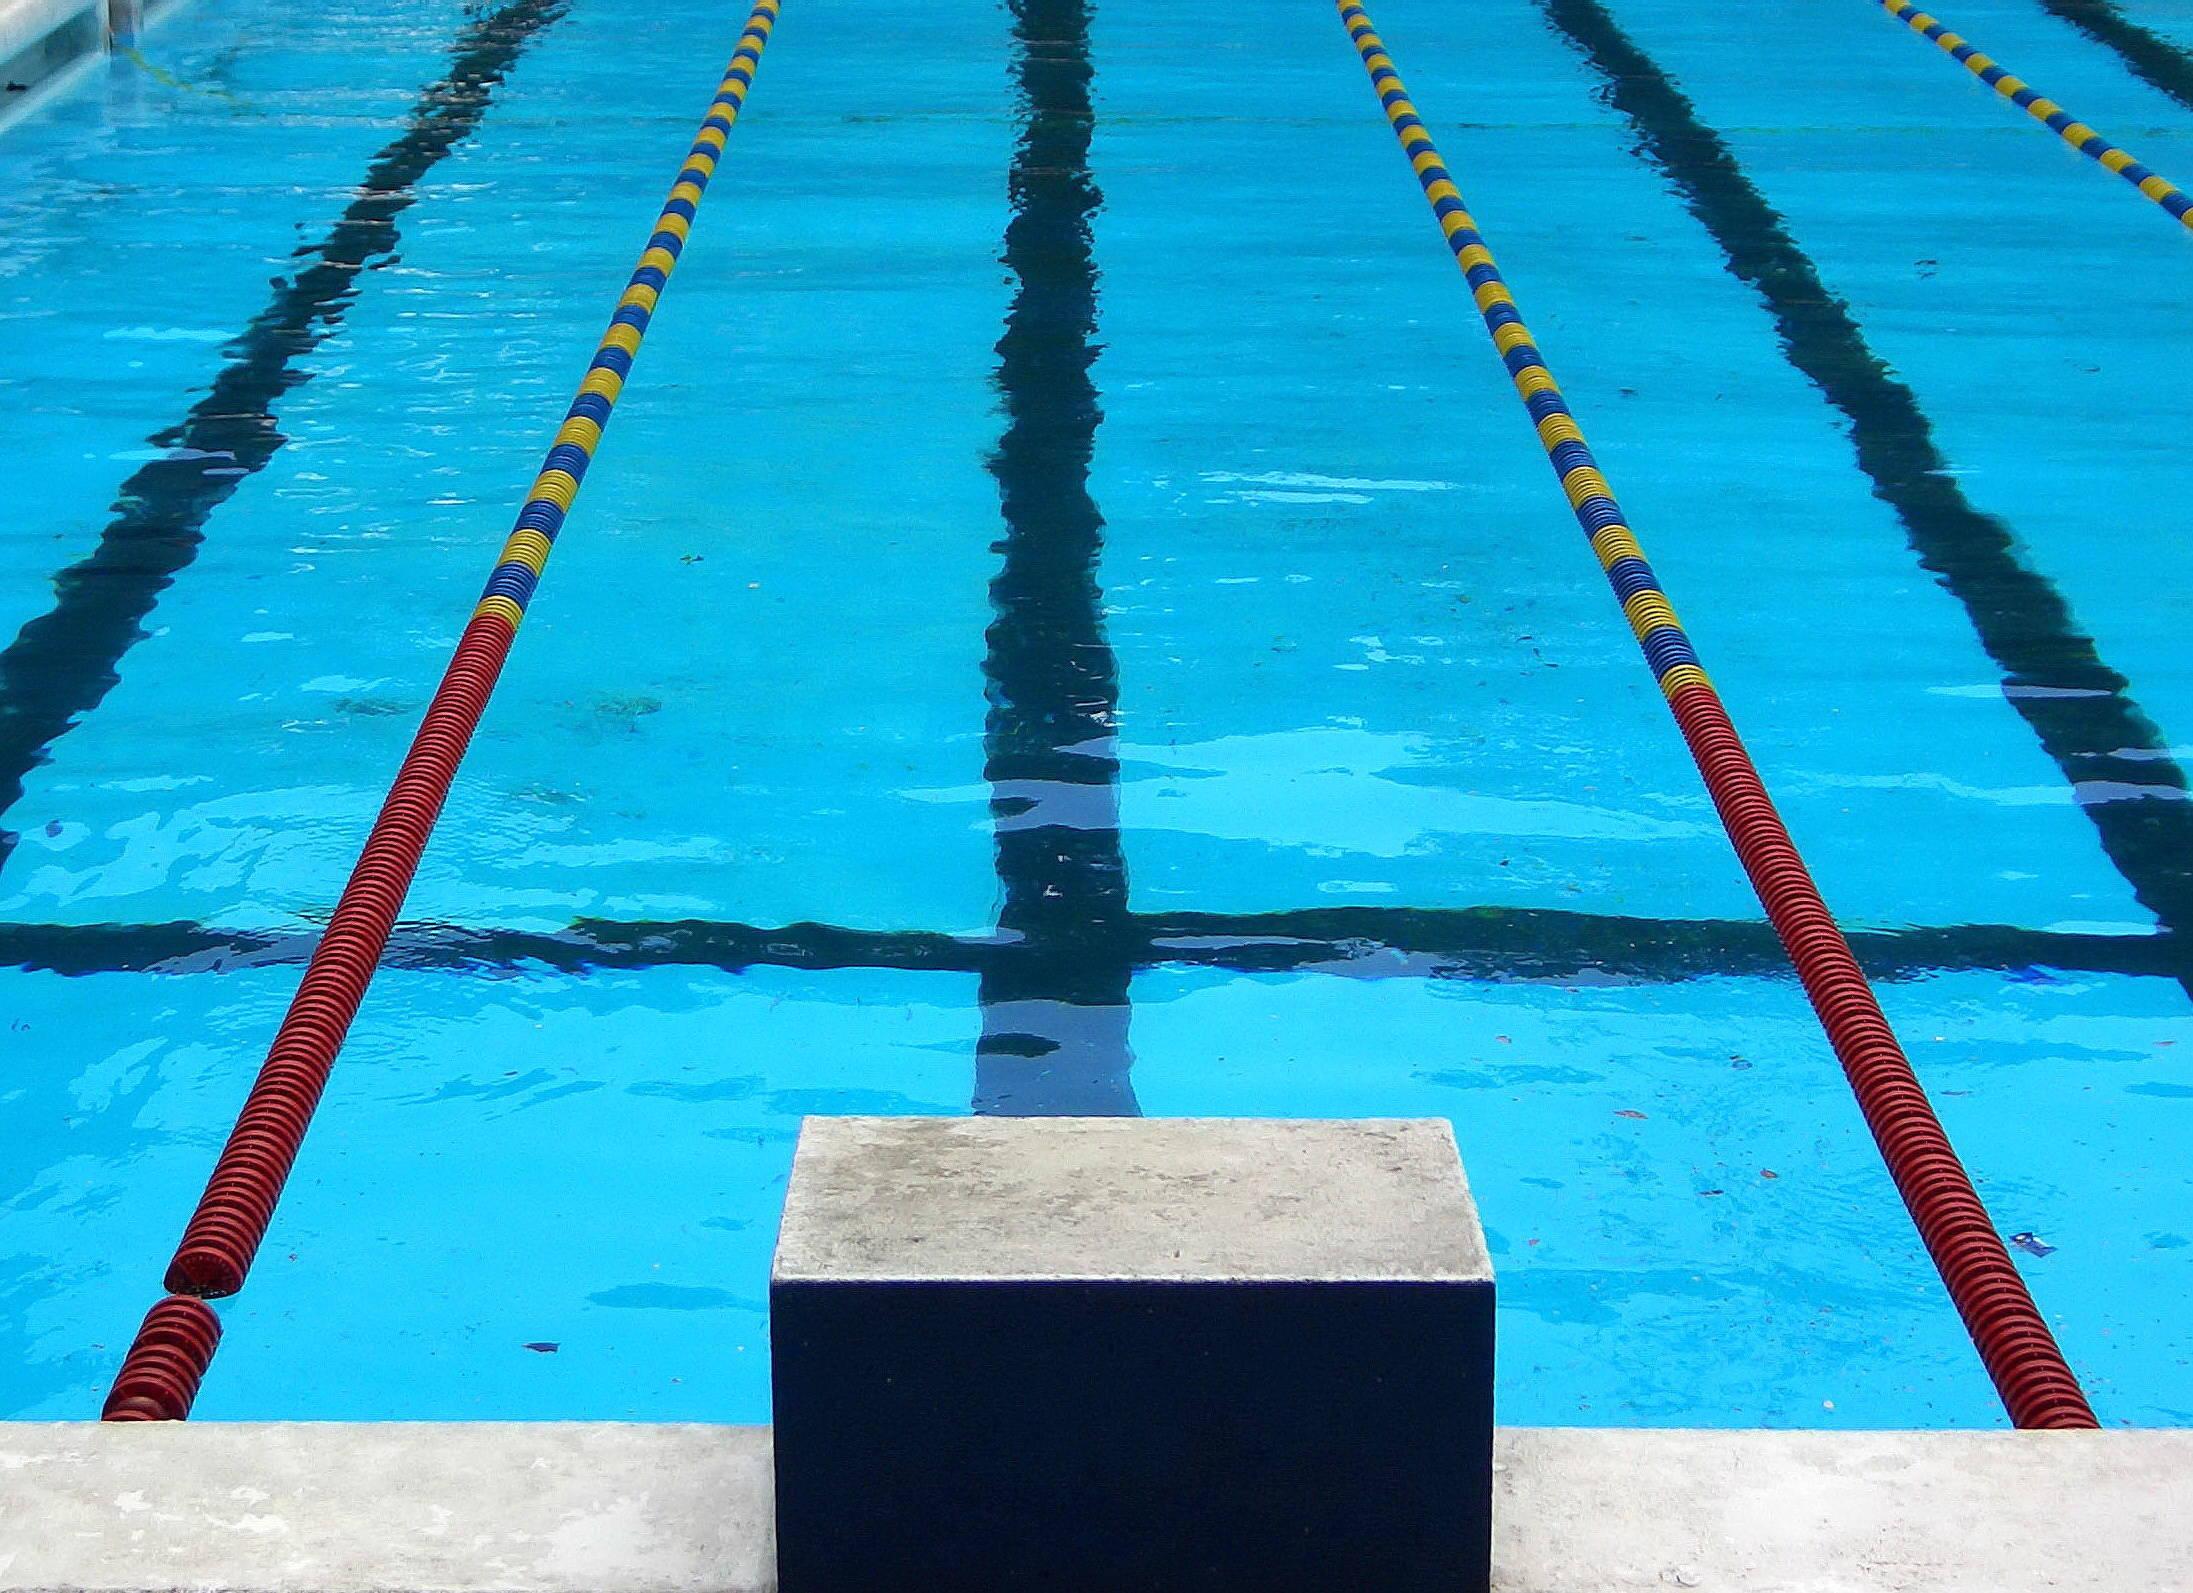 27f5e0f3251563b8eb37_Competition_swimming_pool_block.jpg